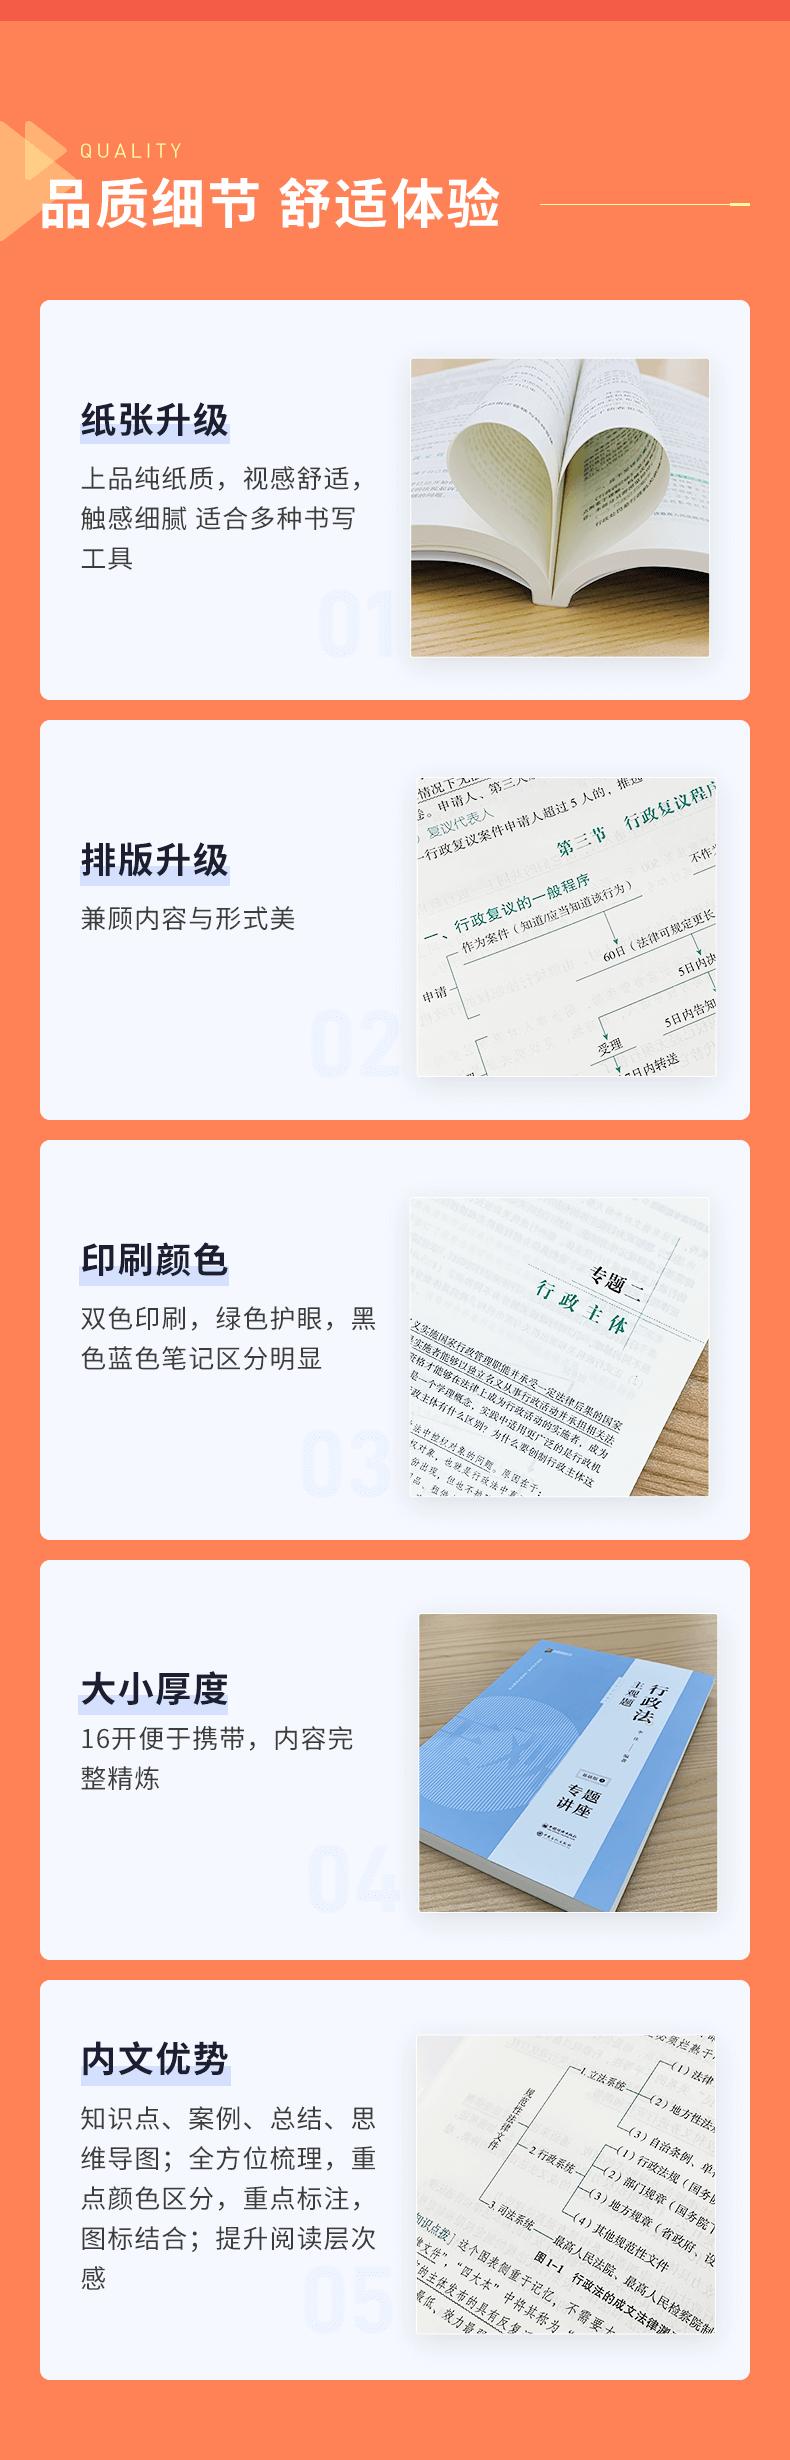 2021主观题学习包_04.png